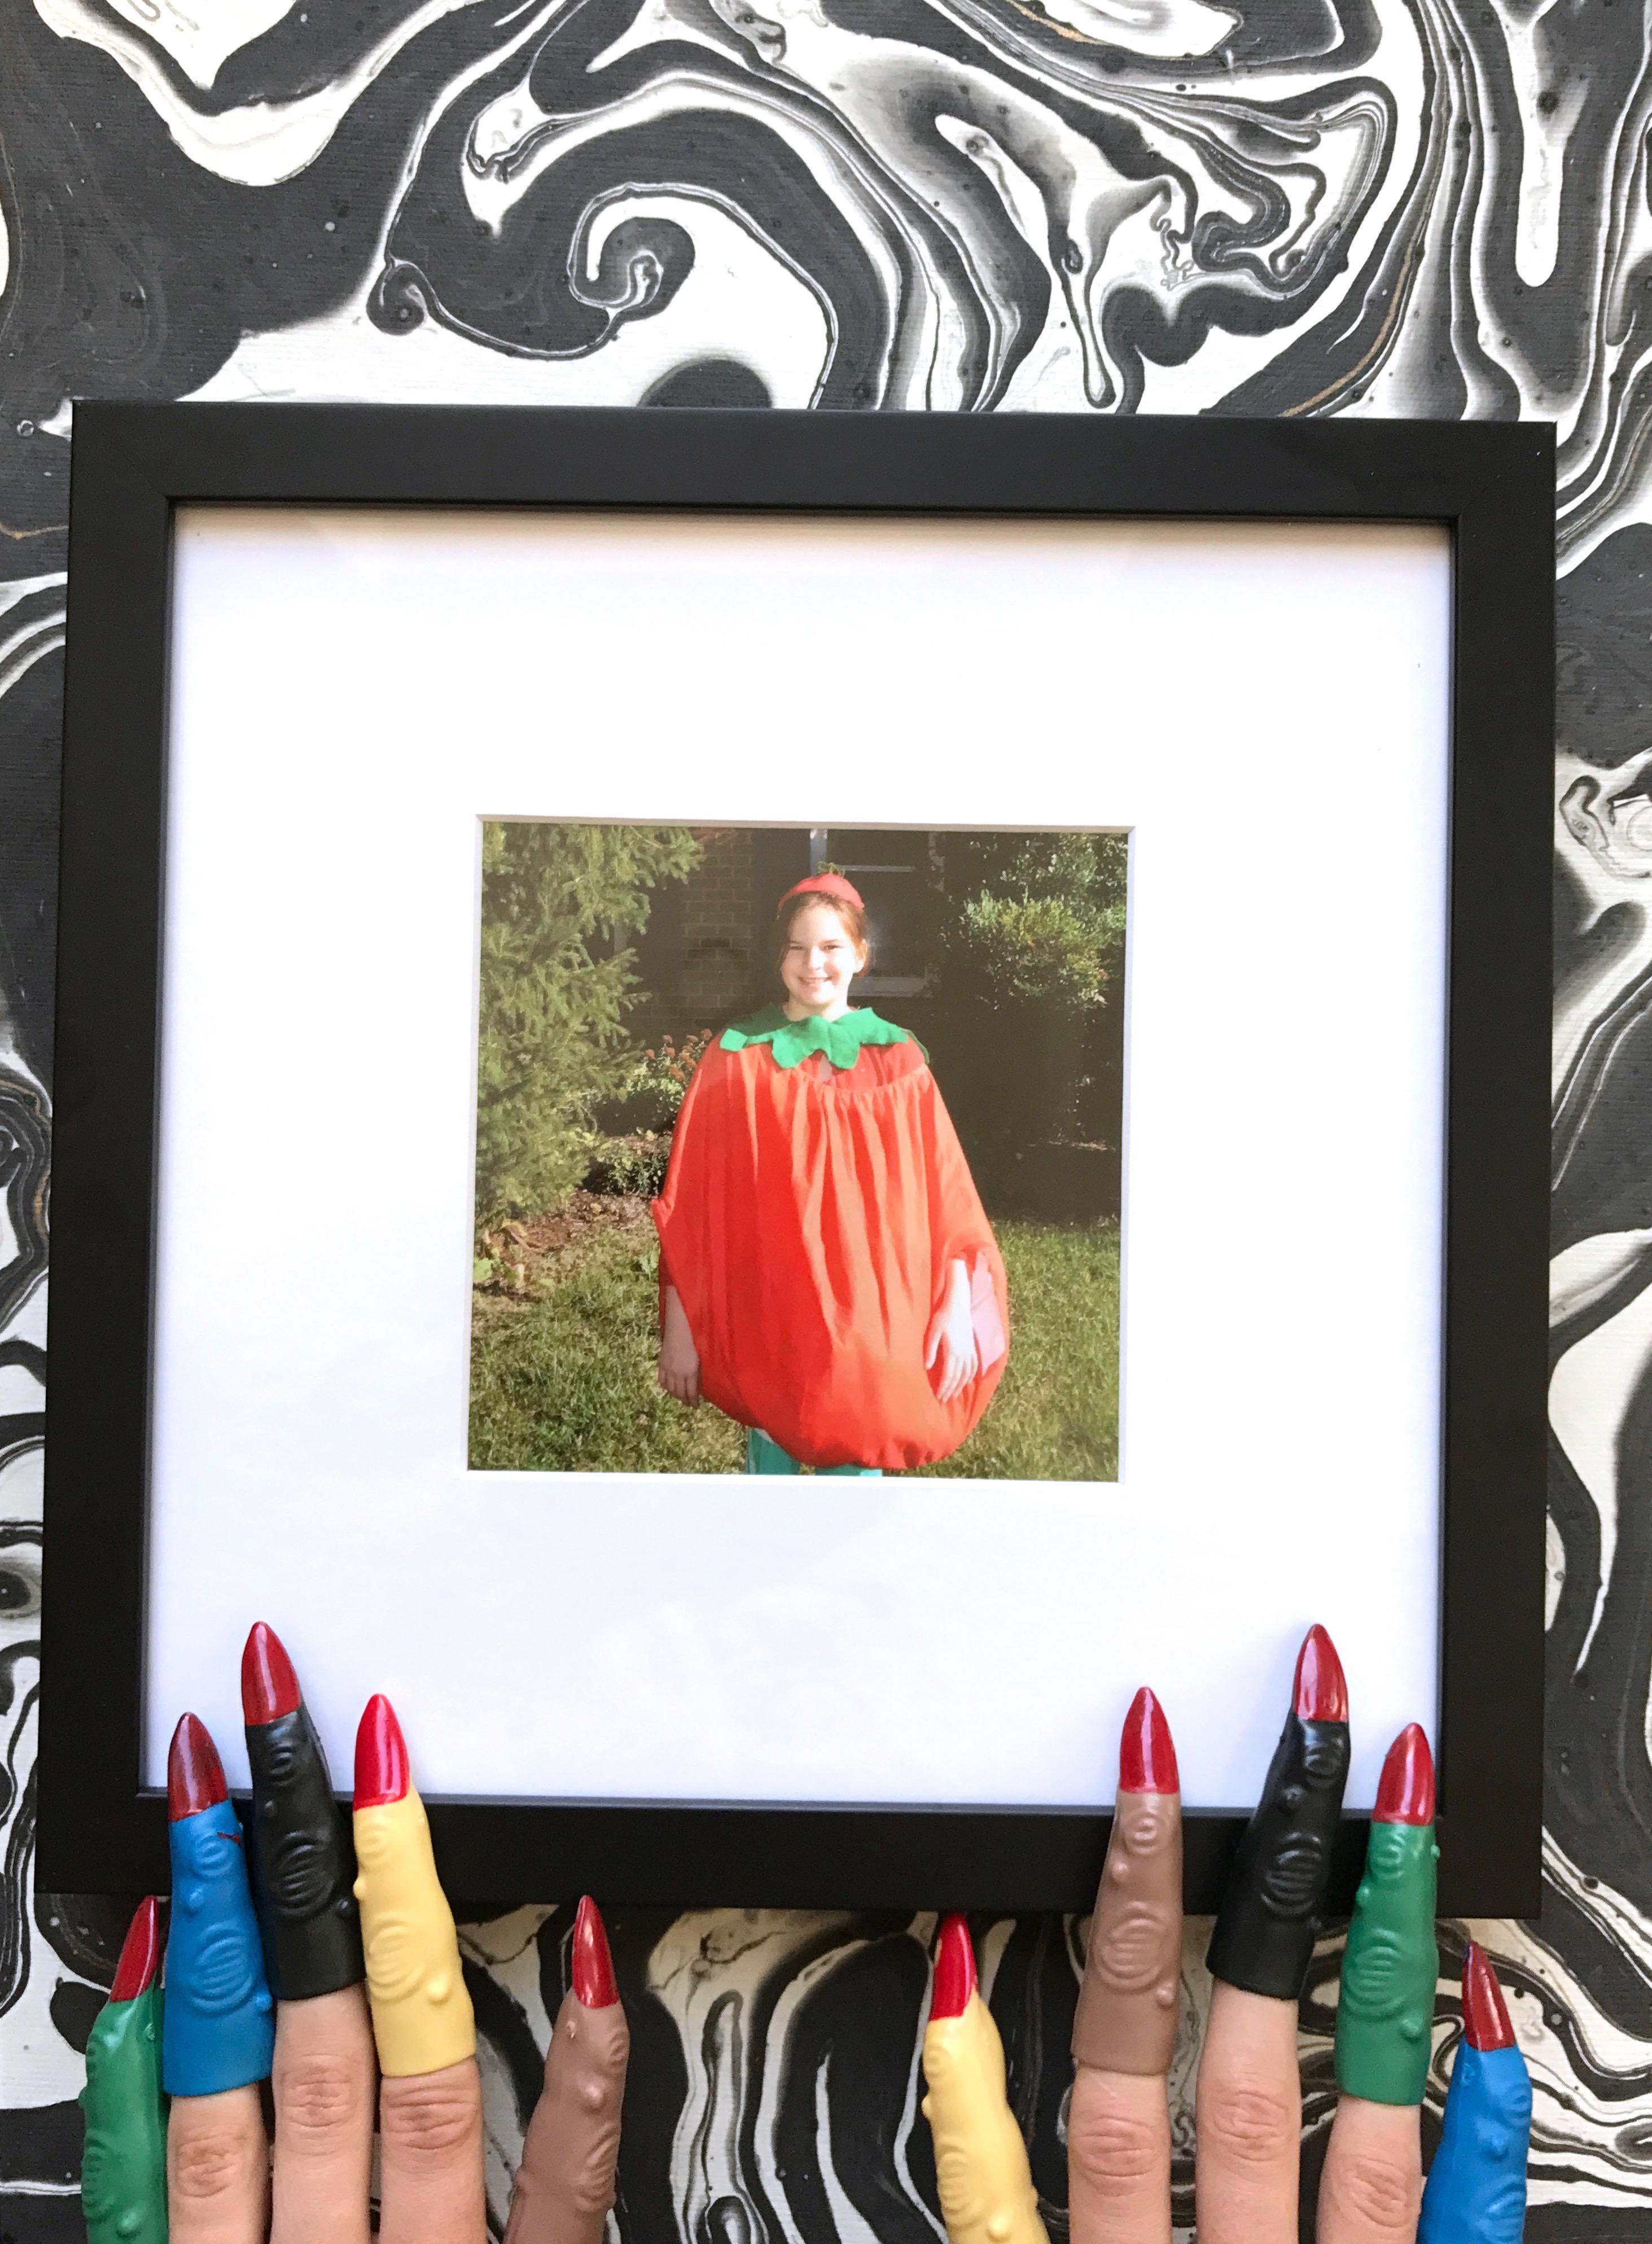 Frame Halloween Photos